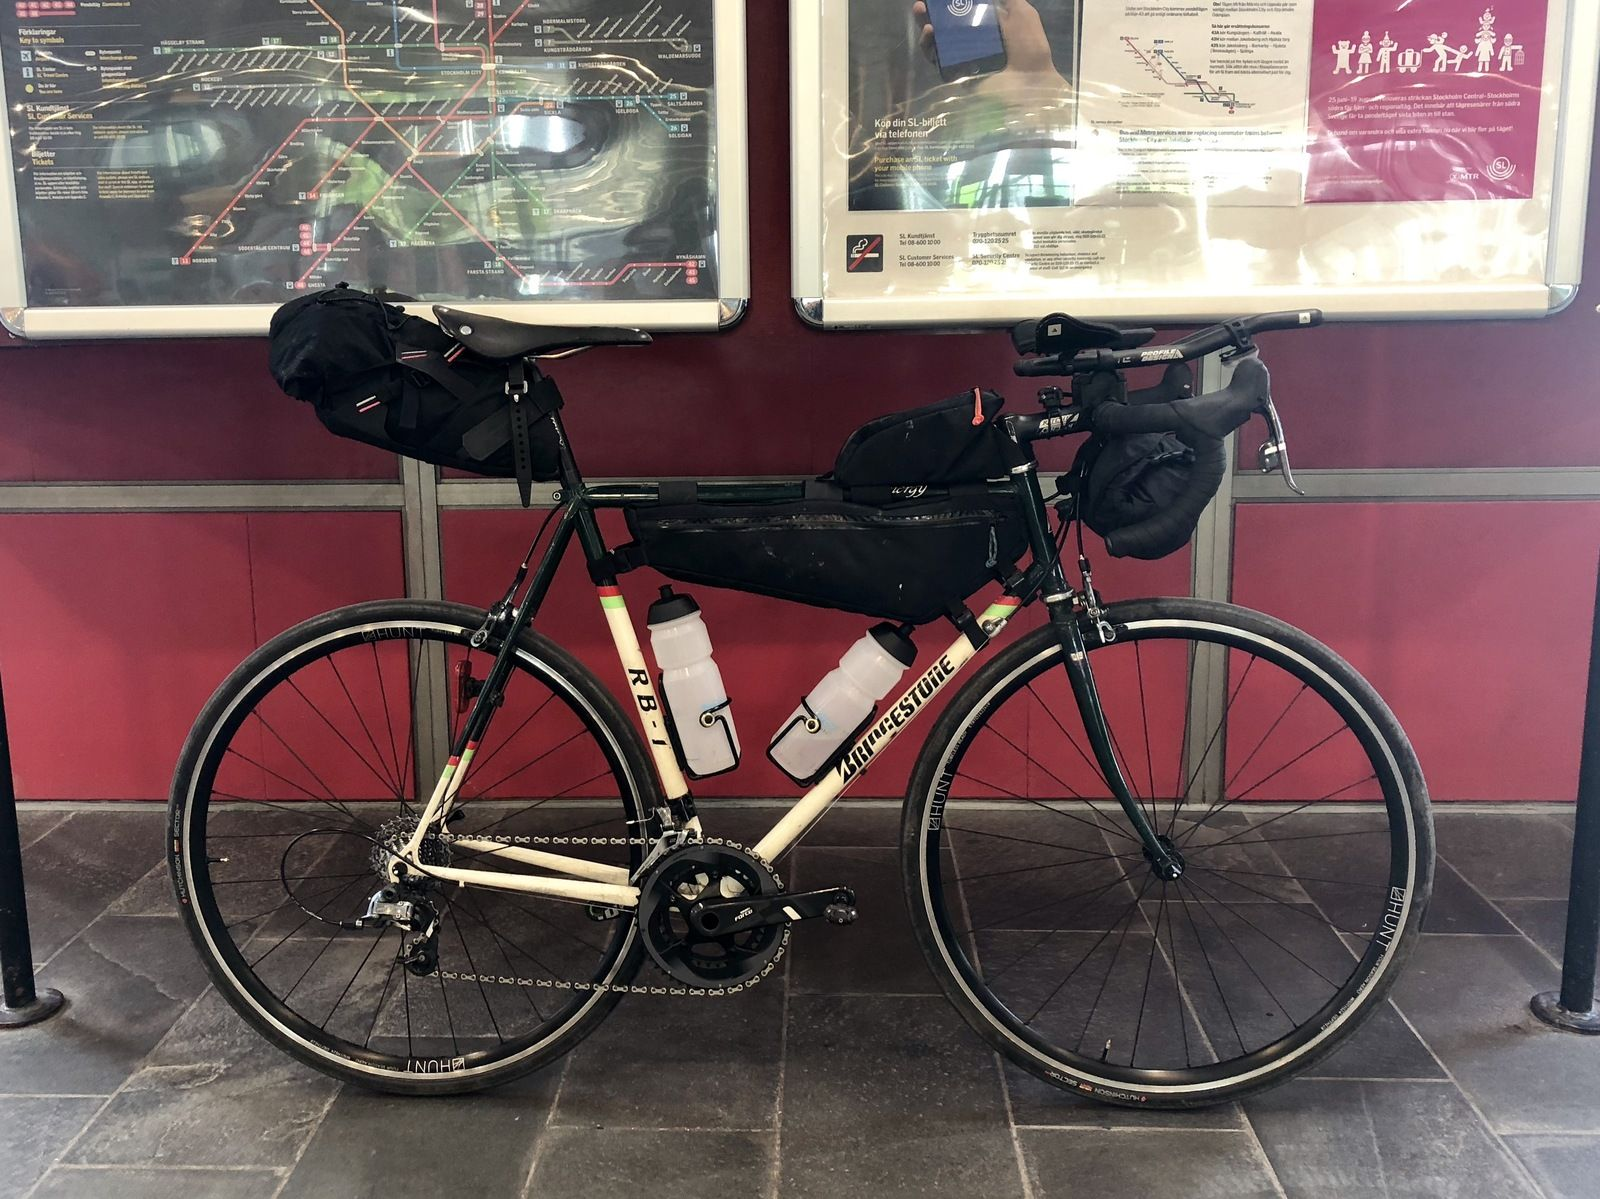 Martins-cykel-01.jpg